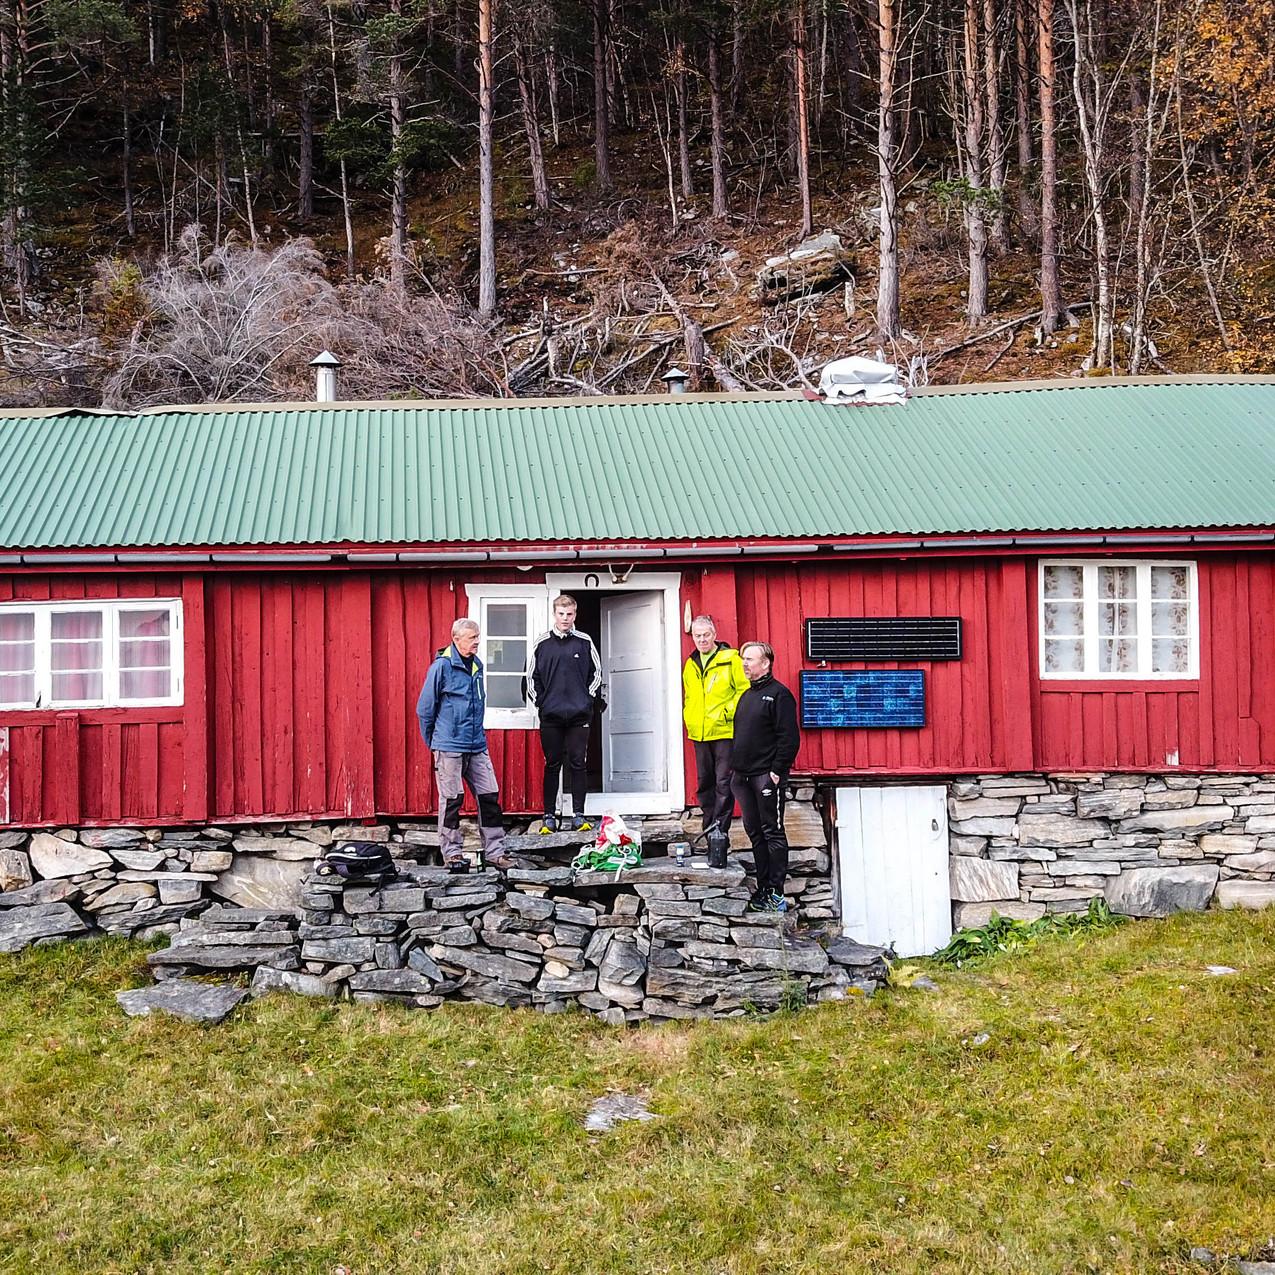 Djupedalen med Storfjordens Venner 19 okt 2017 DJI_0014-12